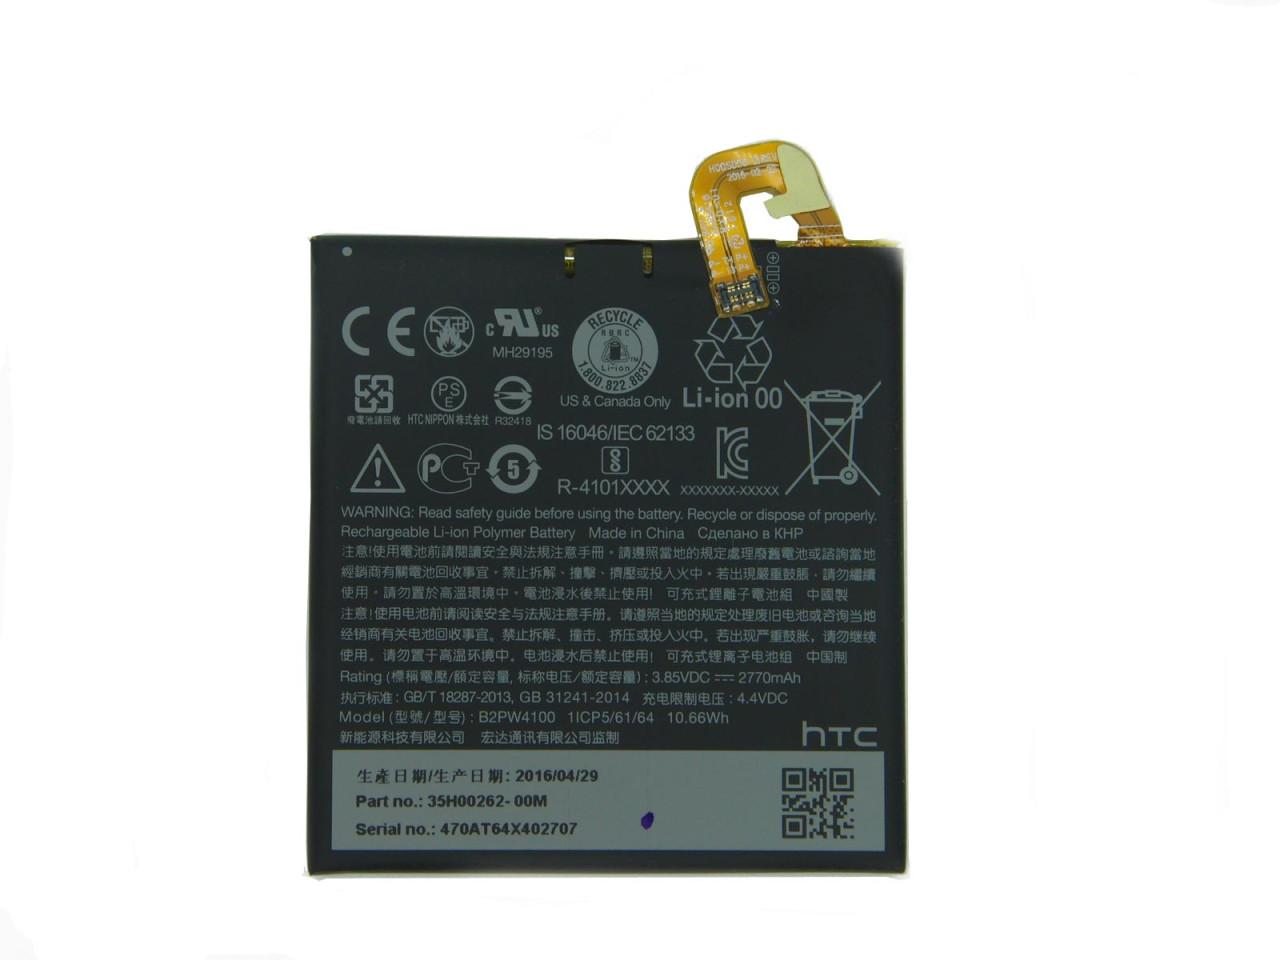 HTC / Google Akku Original Google für Google Pixel, Typ B2PW4100, 35H00262-00M